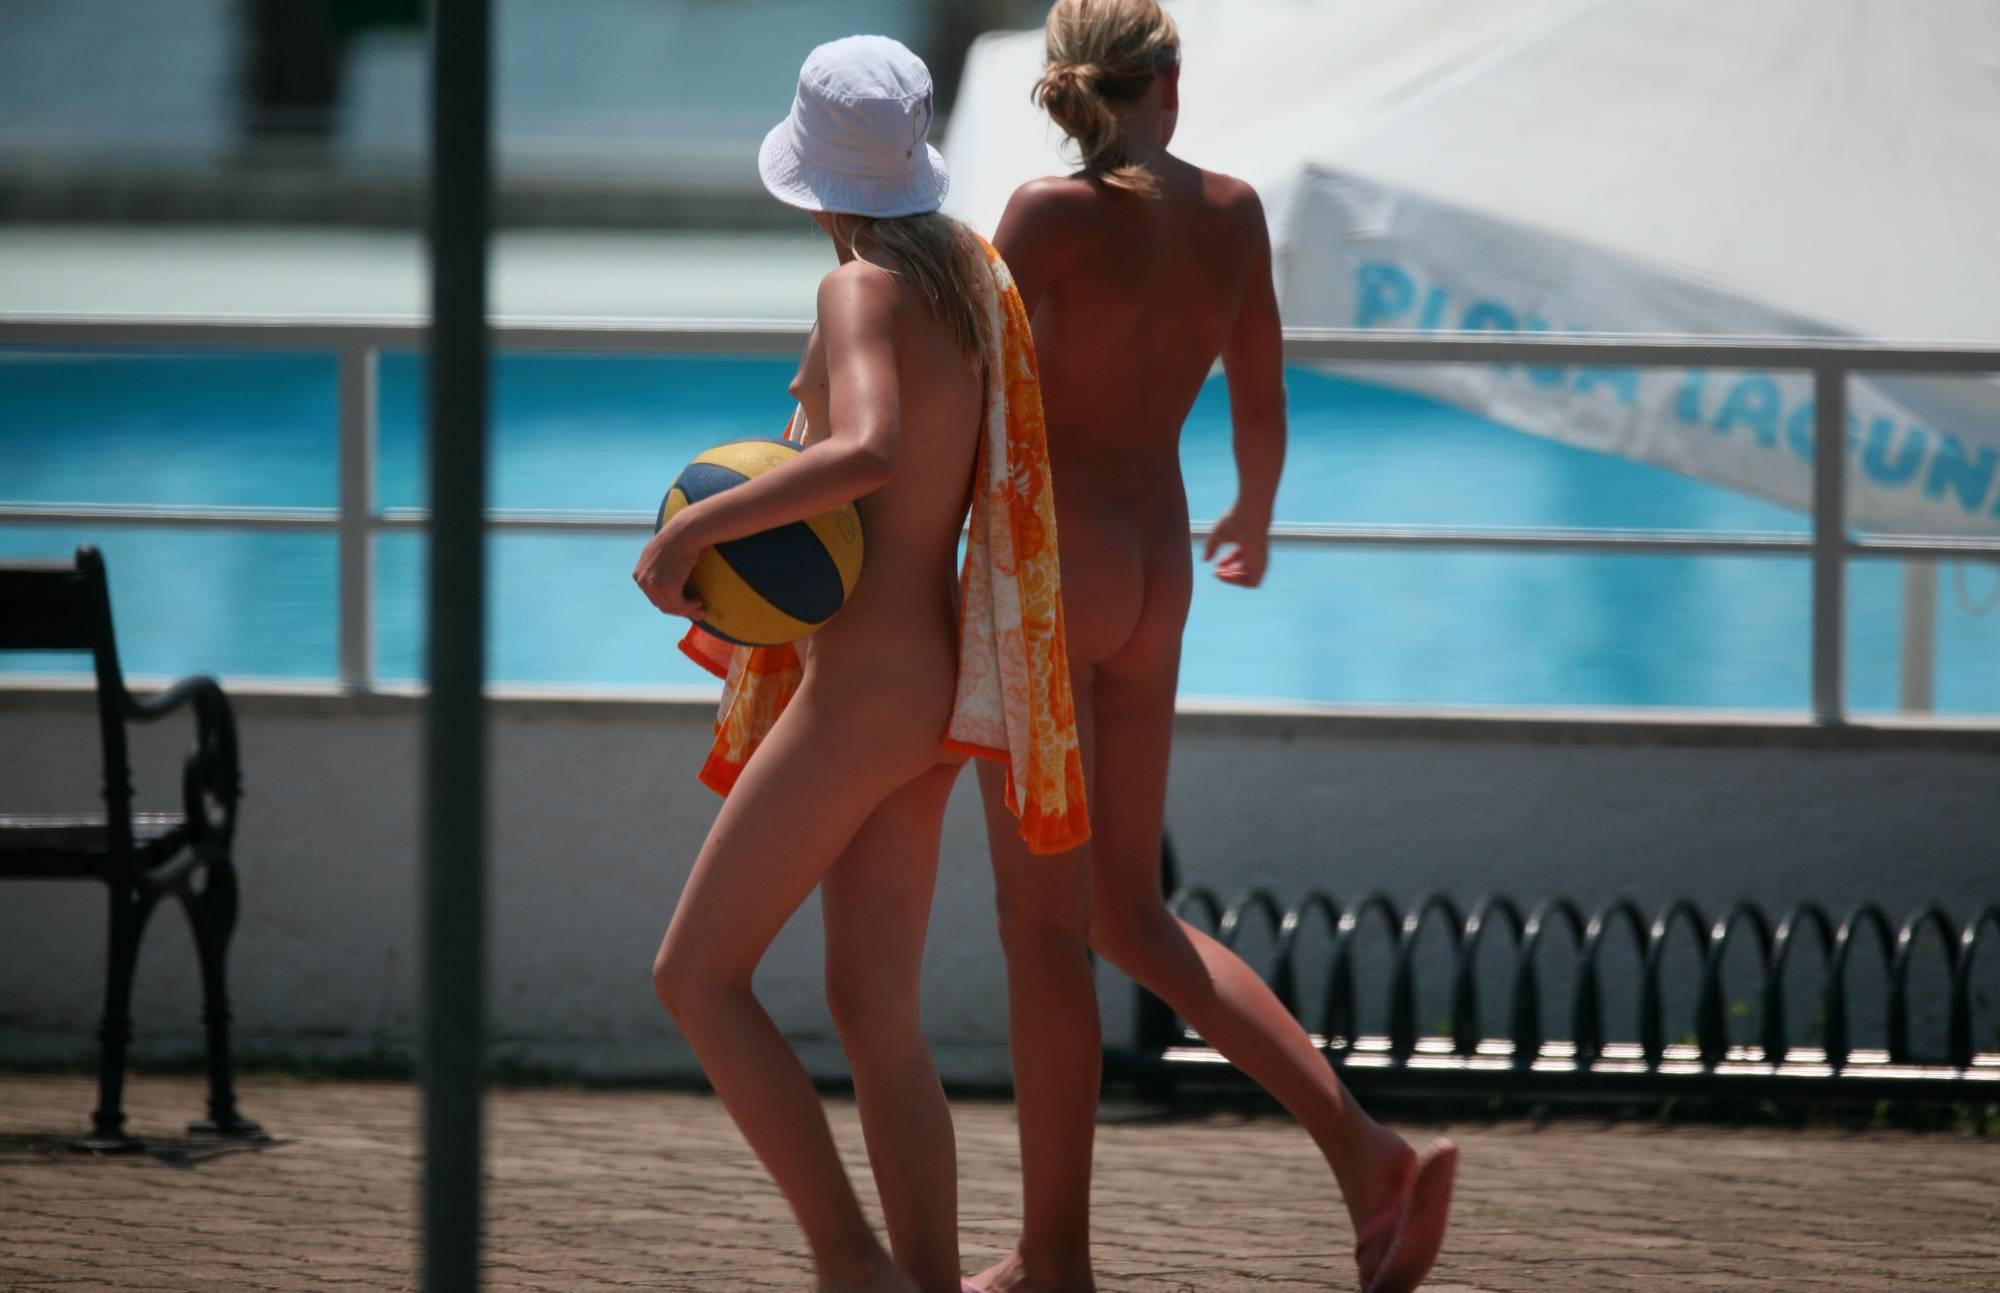 Nudist Photos Two Girlfriends Side-Walk - 1